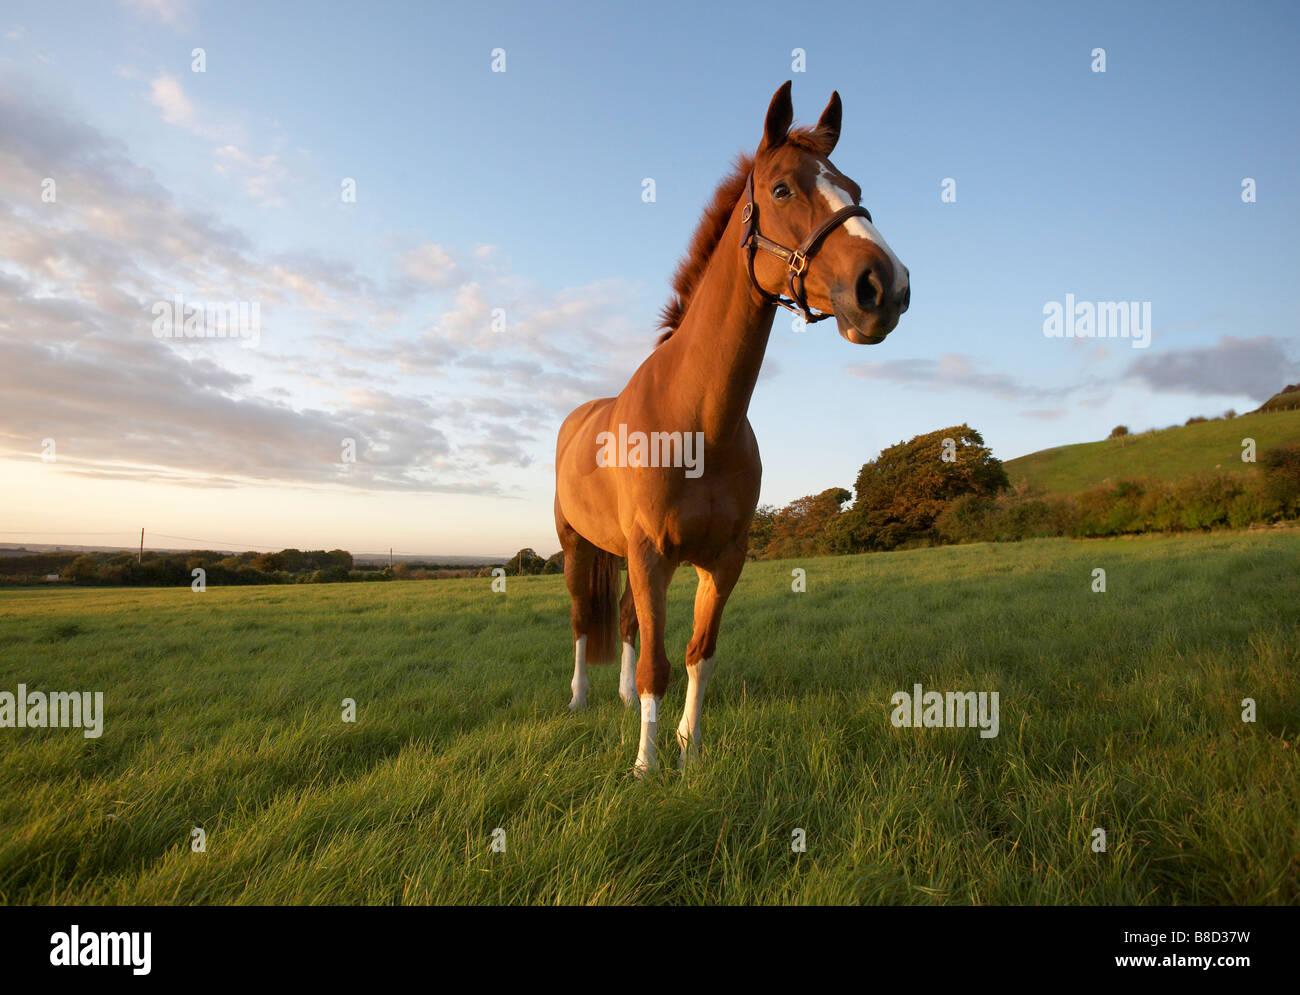 Horse Chestnut Stock Photos & Horse Chestnut Stock Images ... - photo#4